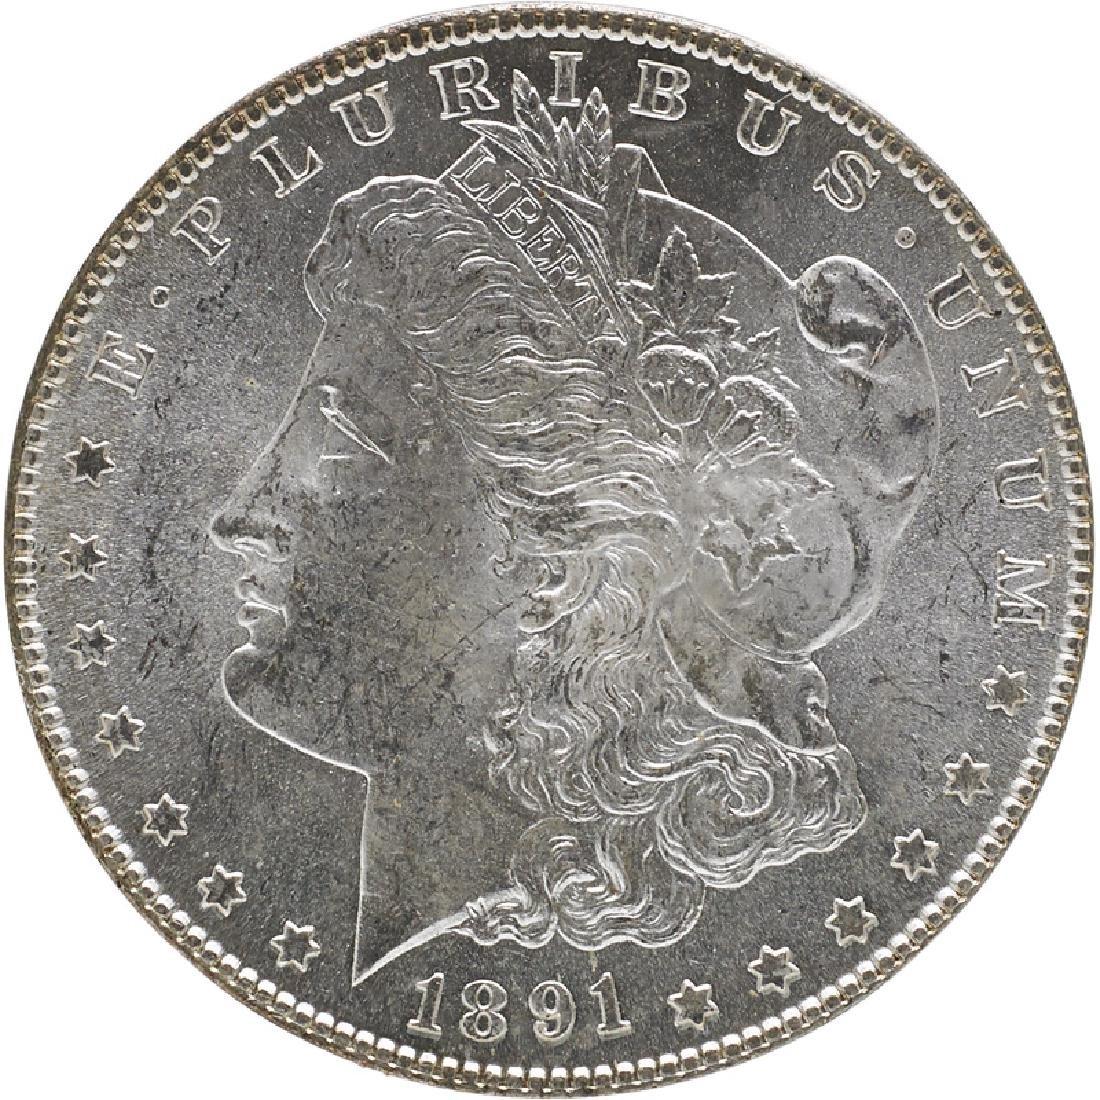 U.S. 1891-S MORGAN $1 COIN